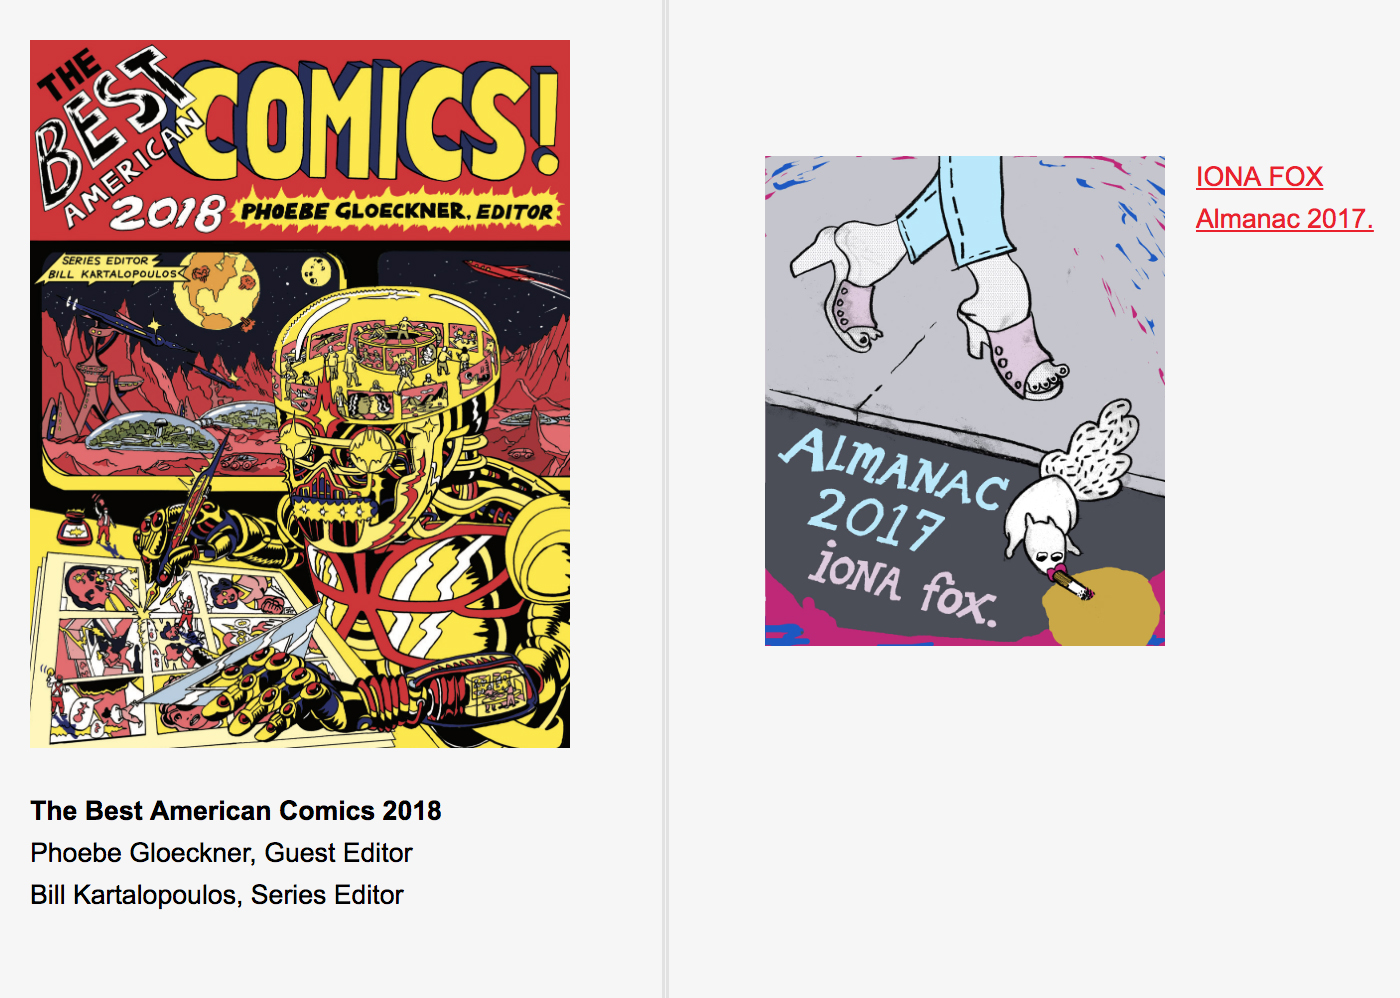 Best American Comics 2018 Notable Comics List: Almanac 2017 by Iona Fox